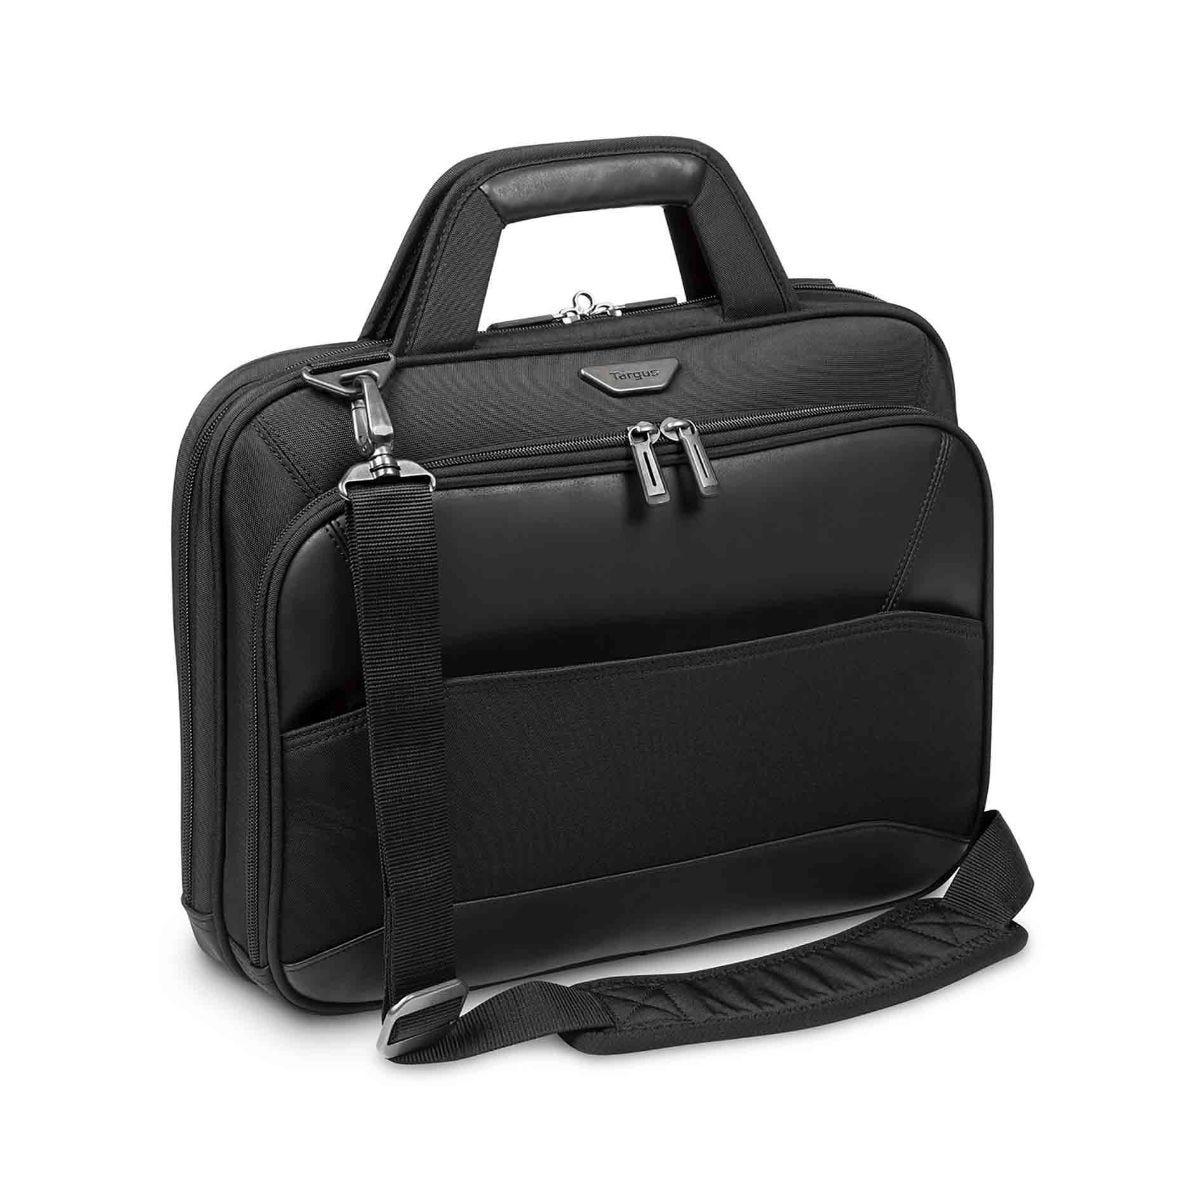 Image of Targus Mobile VIP Topload Laptop Case 14 Inch, Black